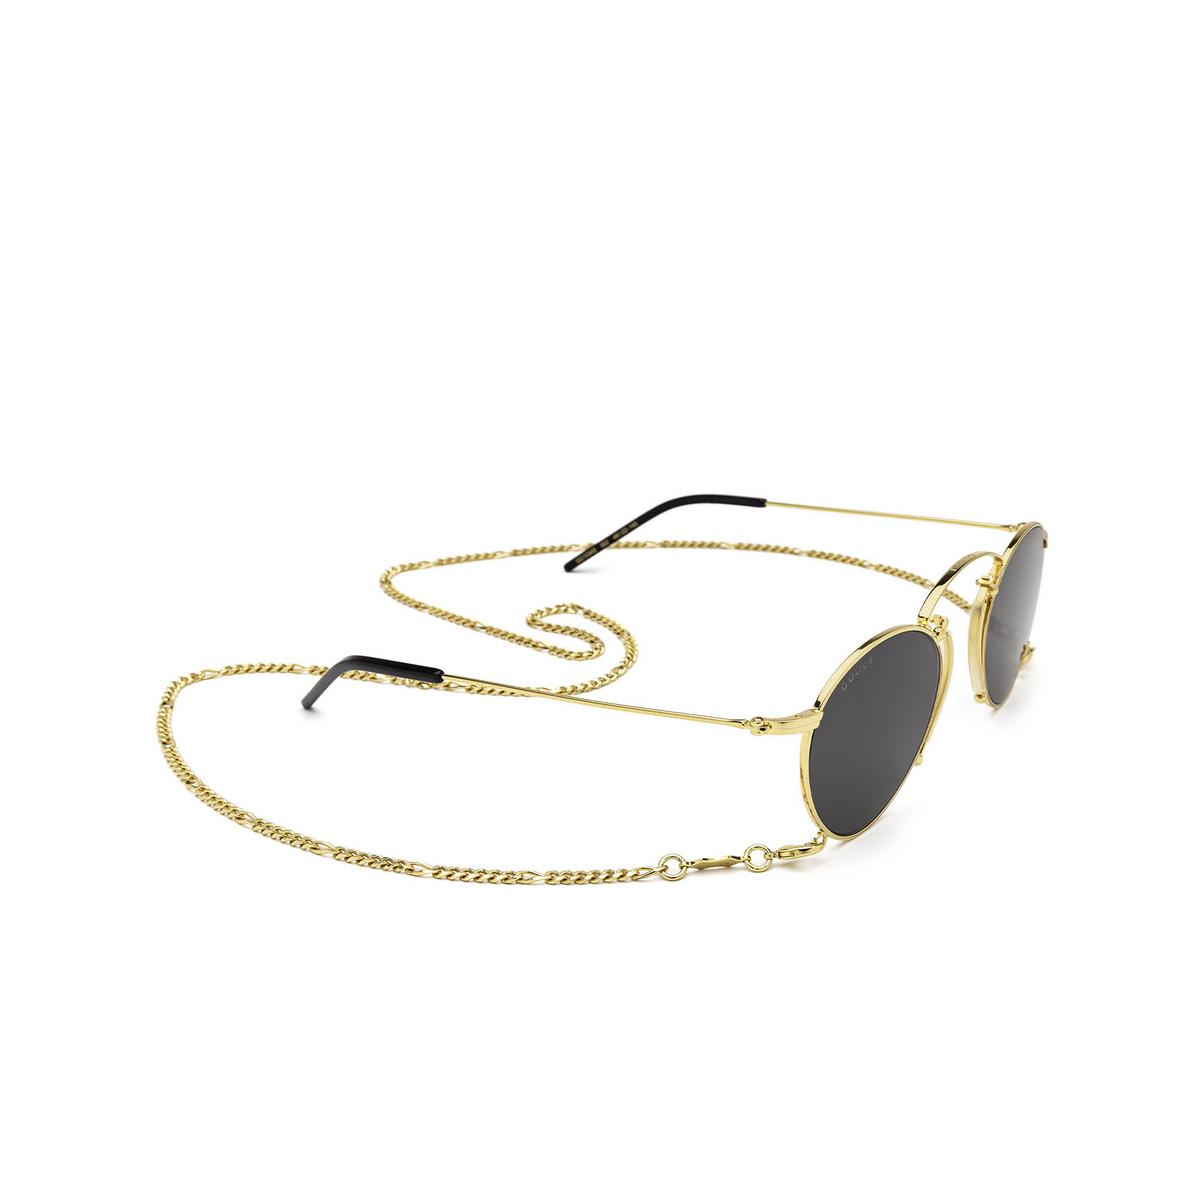 Gucci® Round Sunglasses: GG1034S color Gold 002 - three-quarters view.